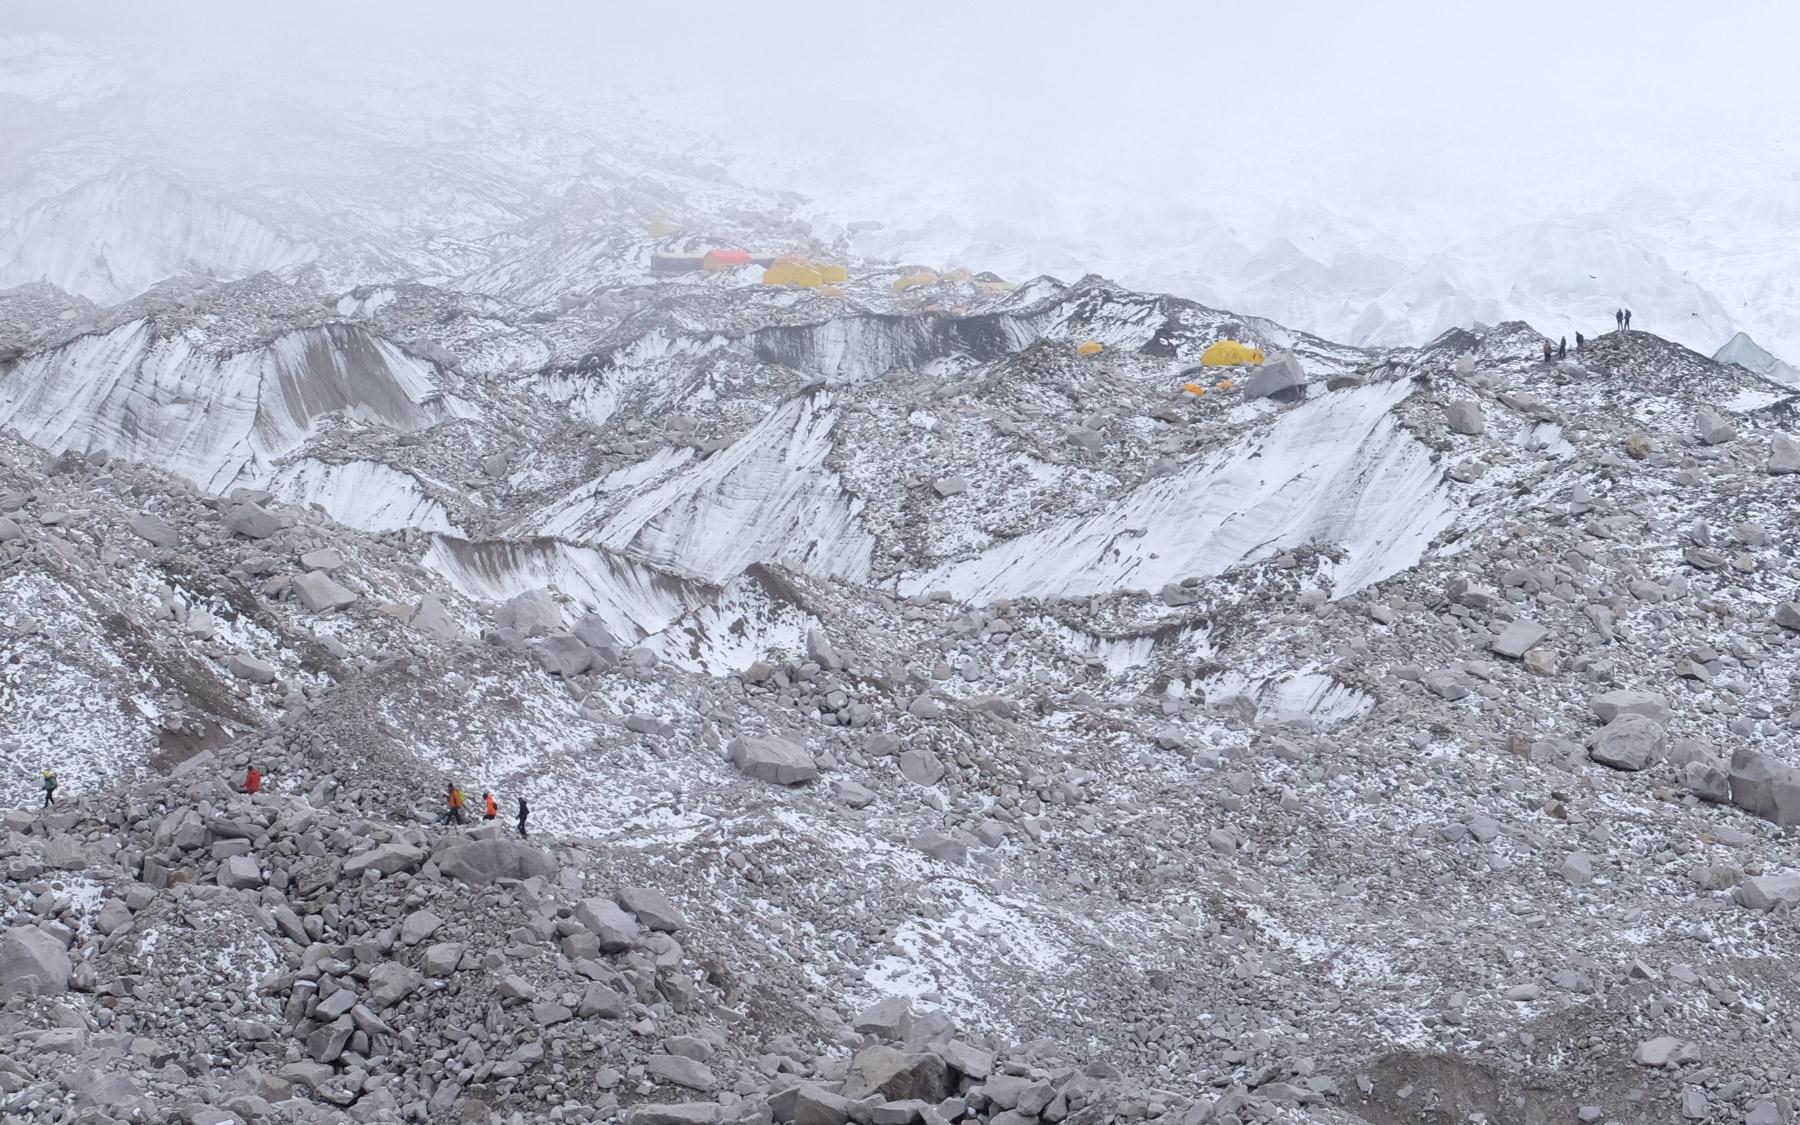 Everest Base Camp, Everest 3 pass #2 32